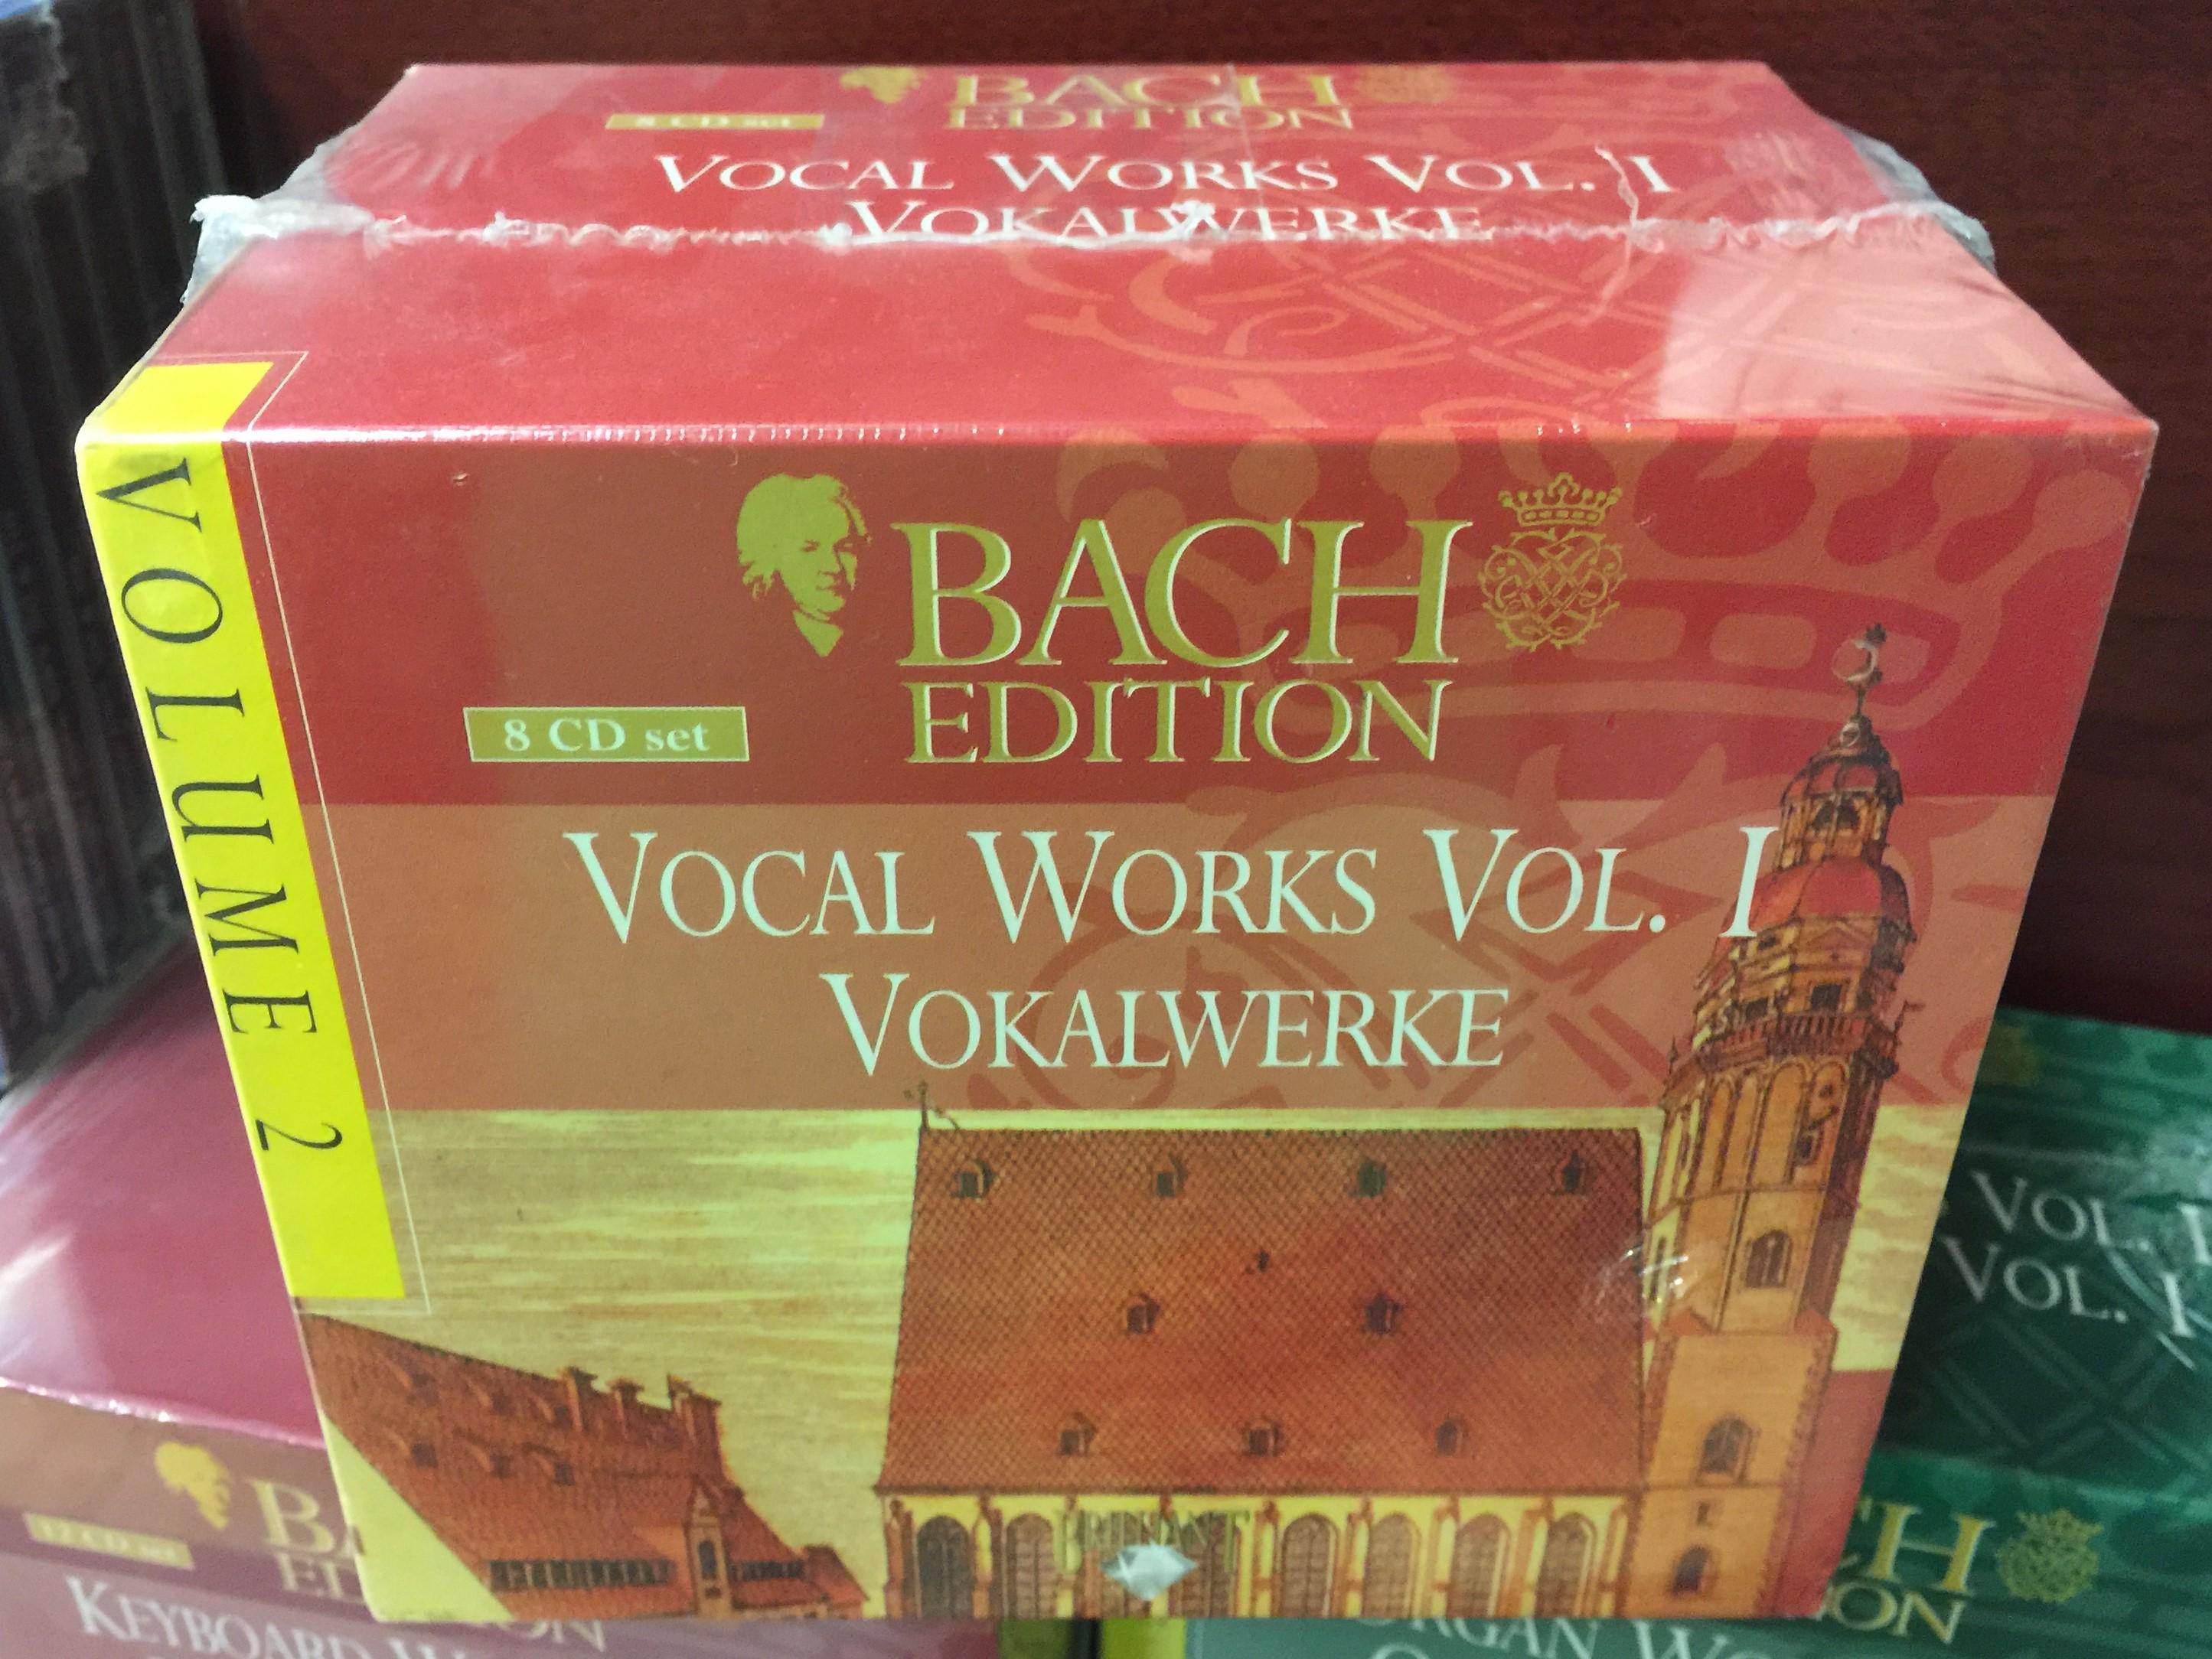 bach-edition-vocal-works-vol.-i-vokalwerke-volume-2-brilliant-classics-8x-audio-cd-box-set-99361-1-.jpg